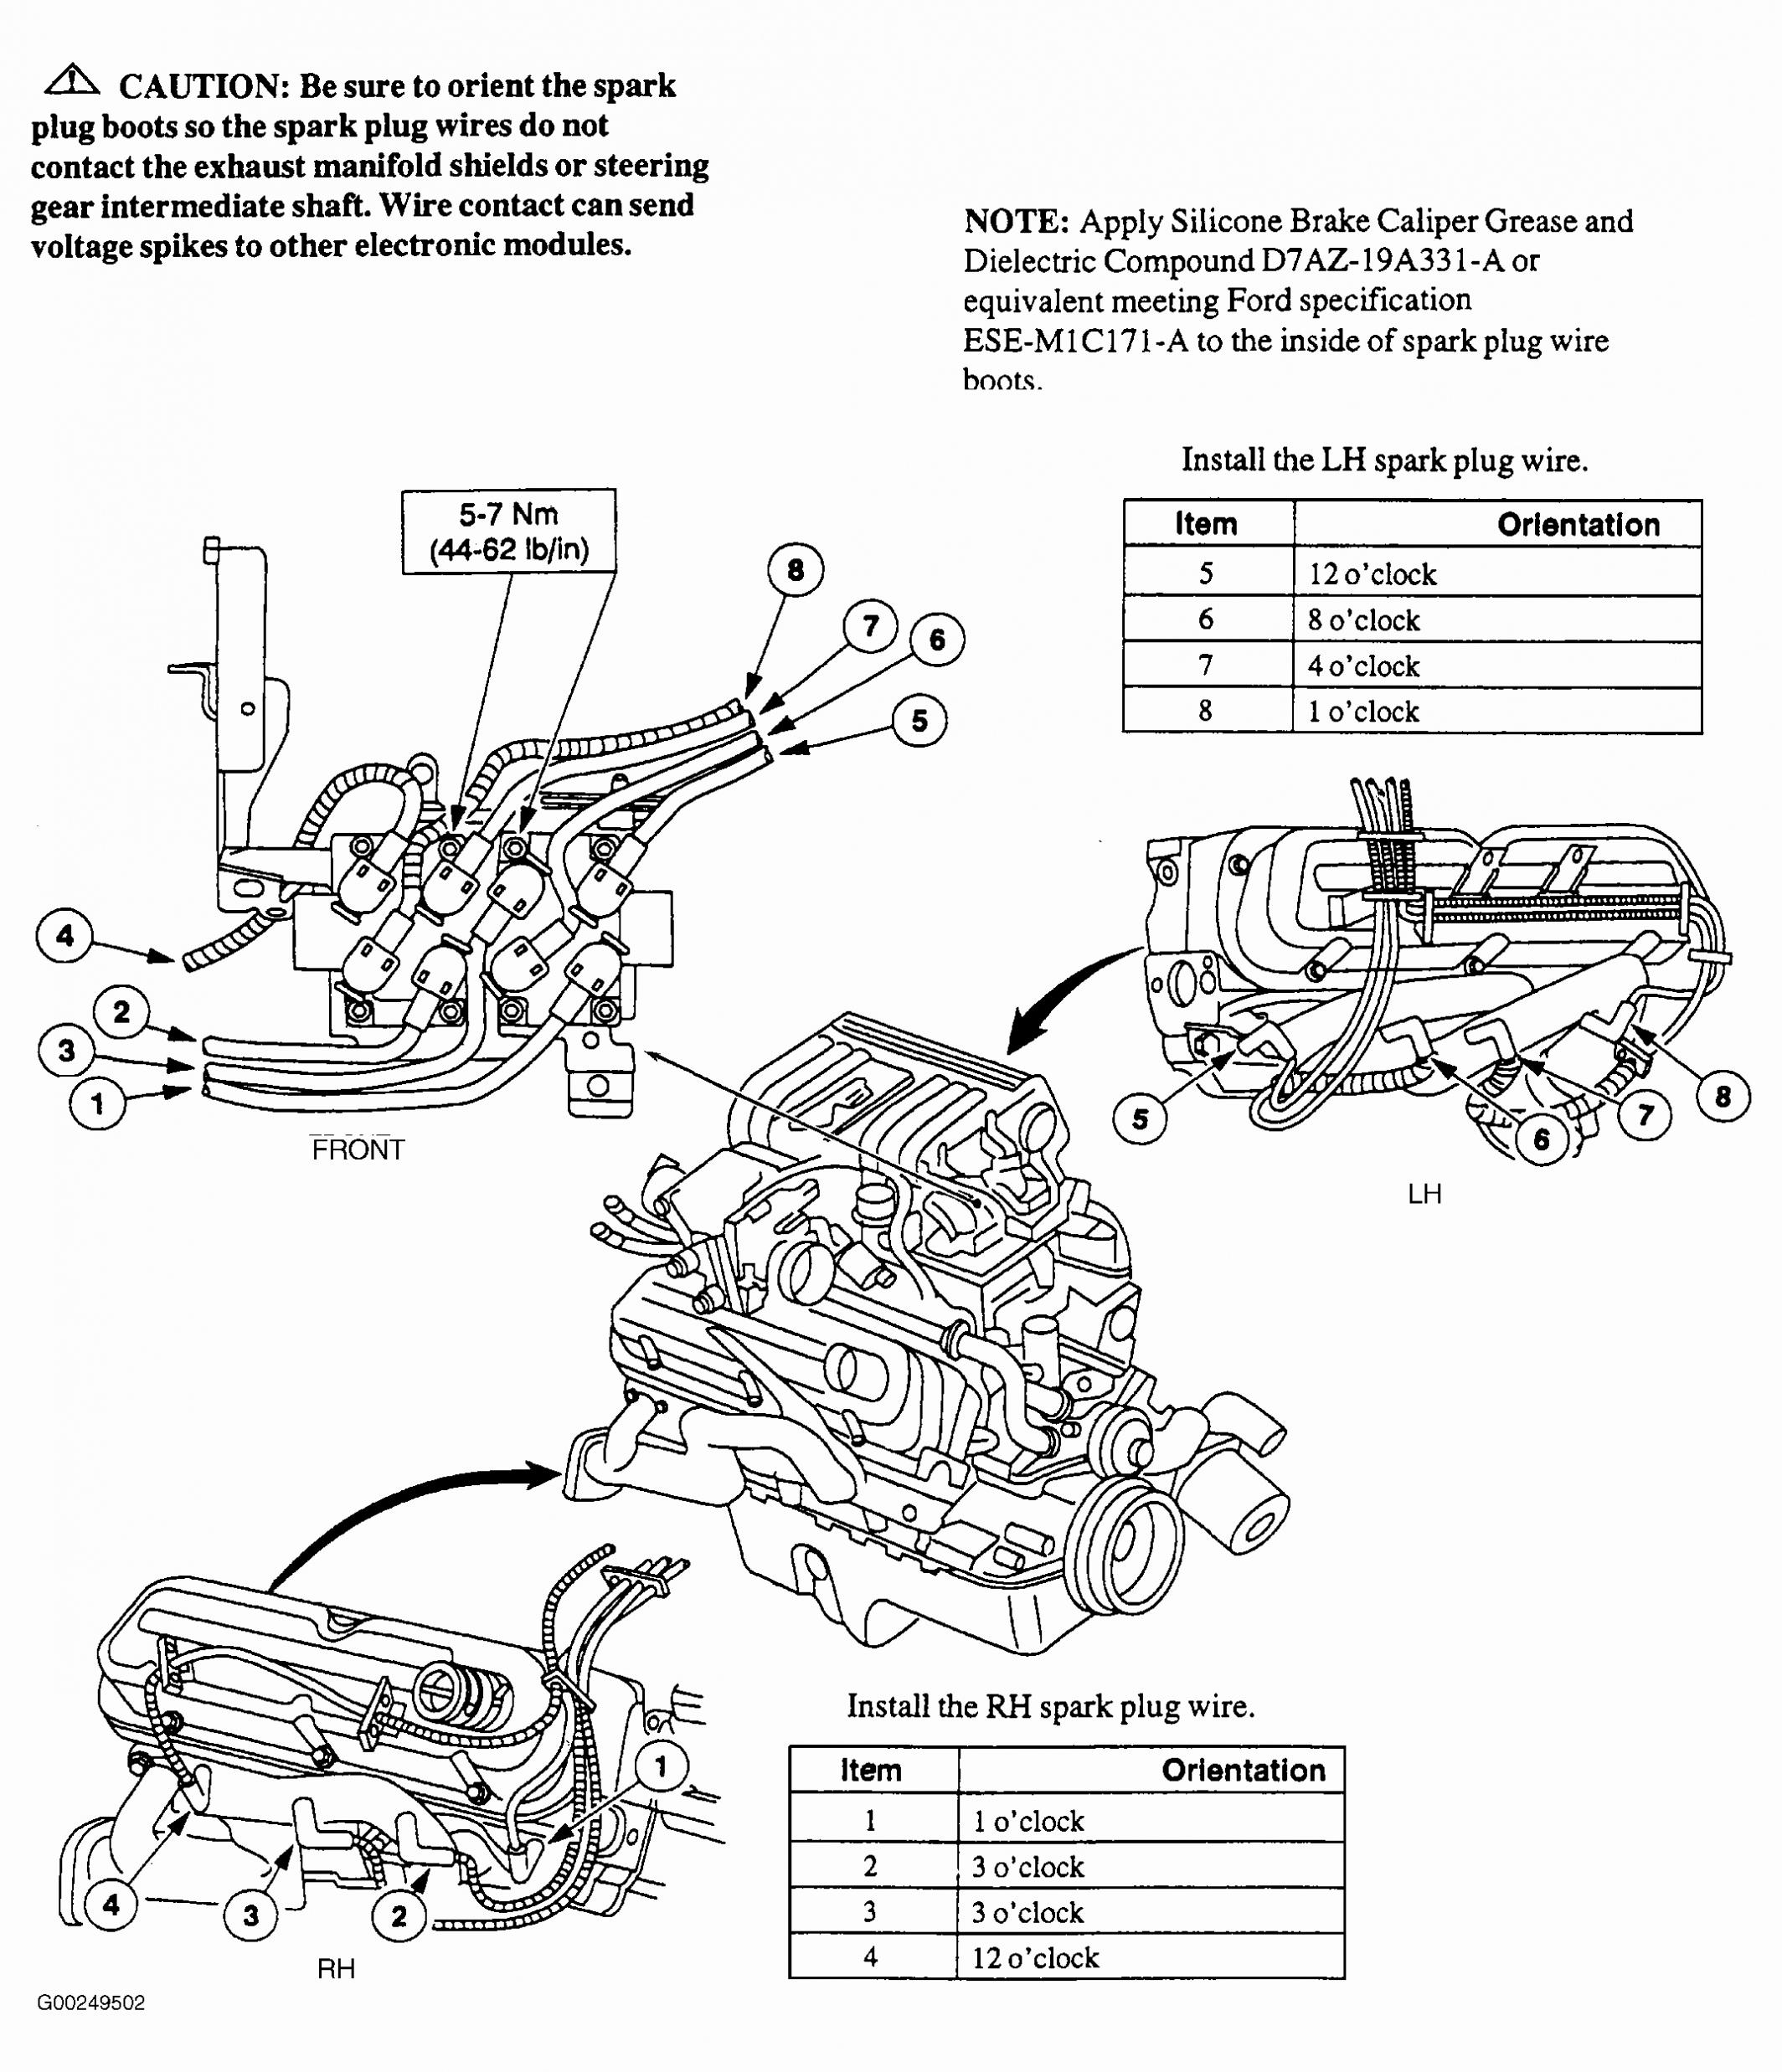 Ford 3 8 Engine Diagram Spark Plug - Center Wiring Diagram